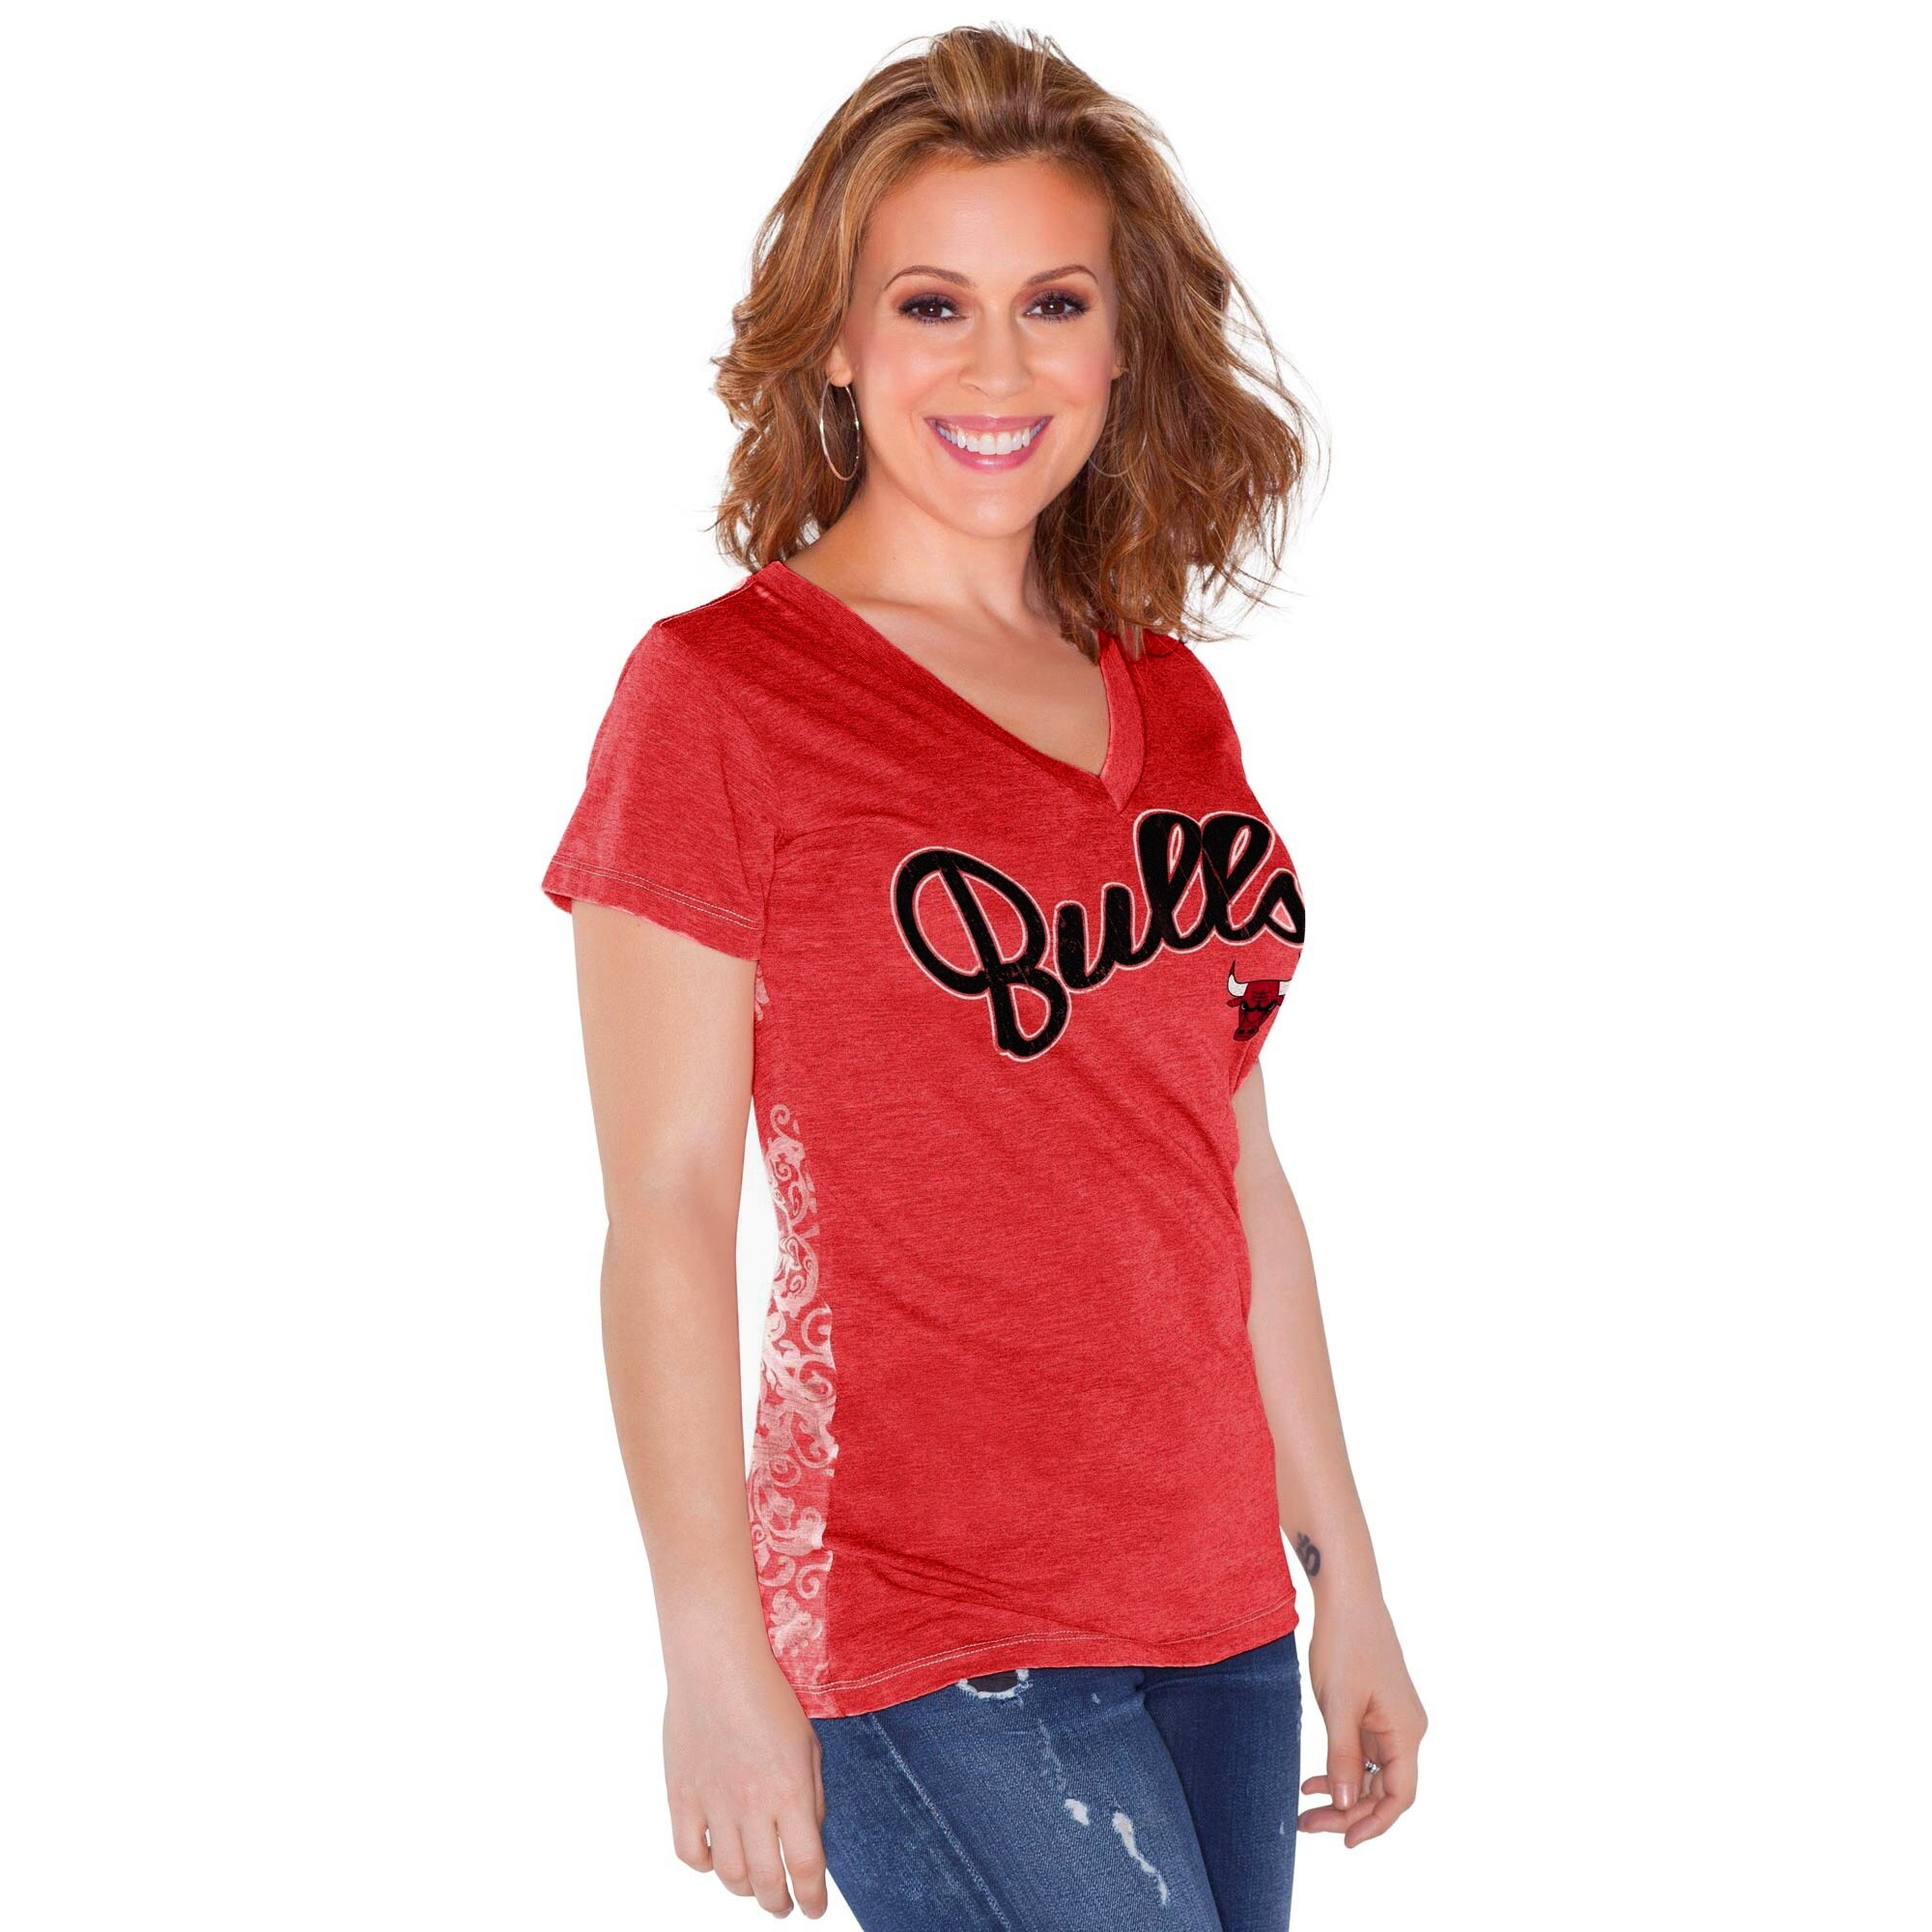 Chicago Bulls Touch by Alyssa Milano Women's Audrey V-Neck T-Shirt - Red